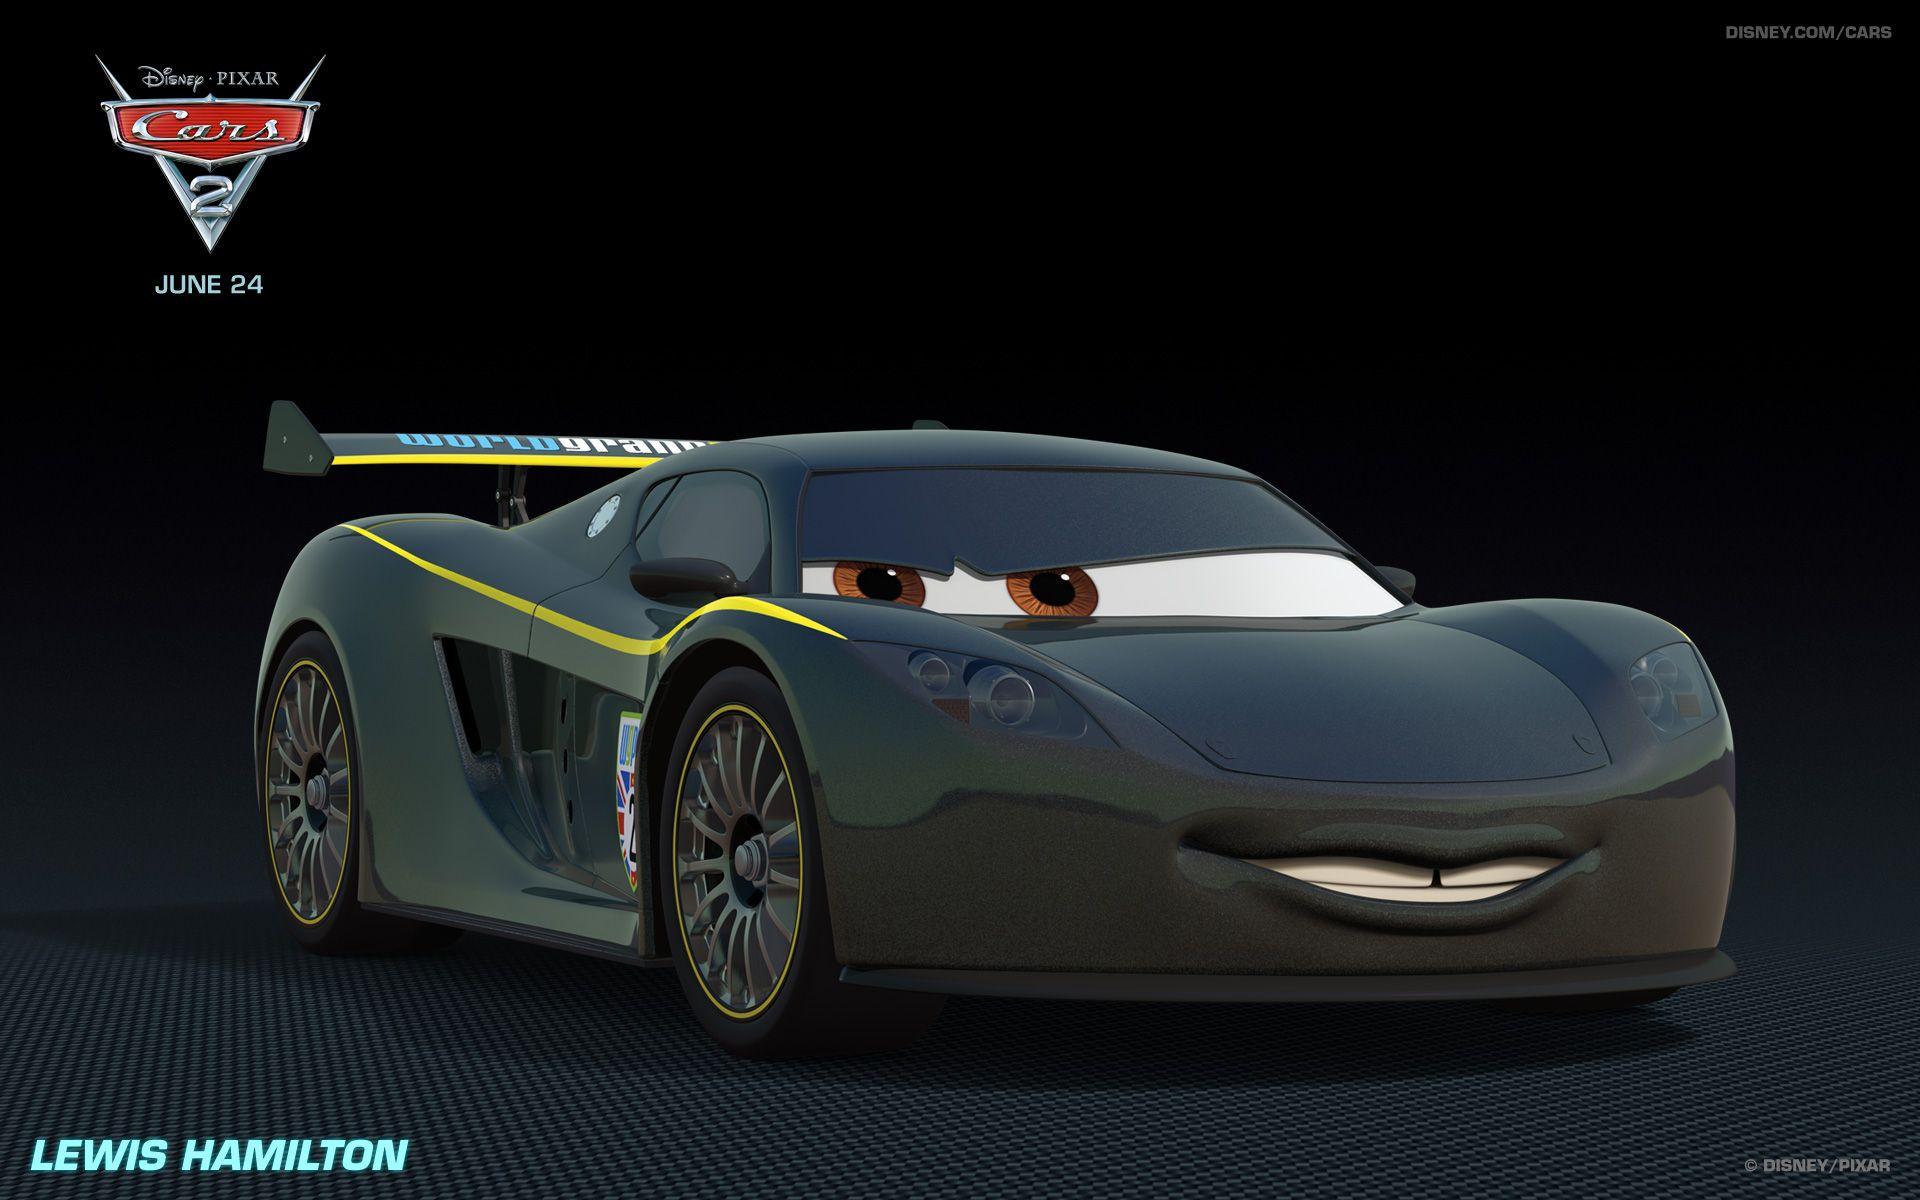 Lewis Hamilton Cars Characters Cars Movie Disney Cars